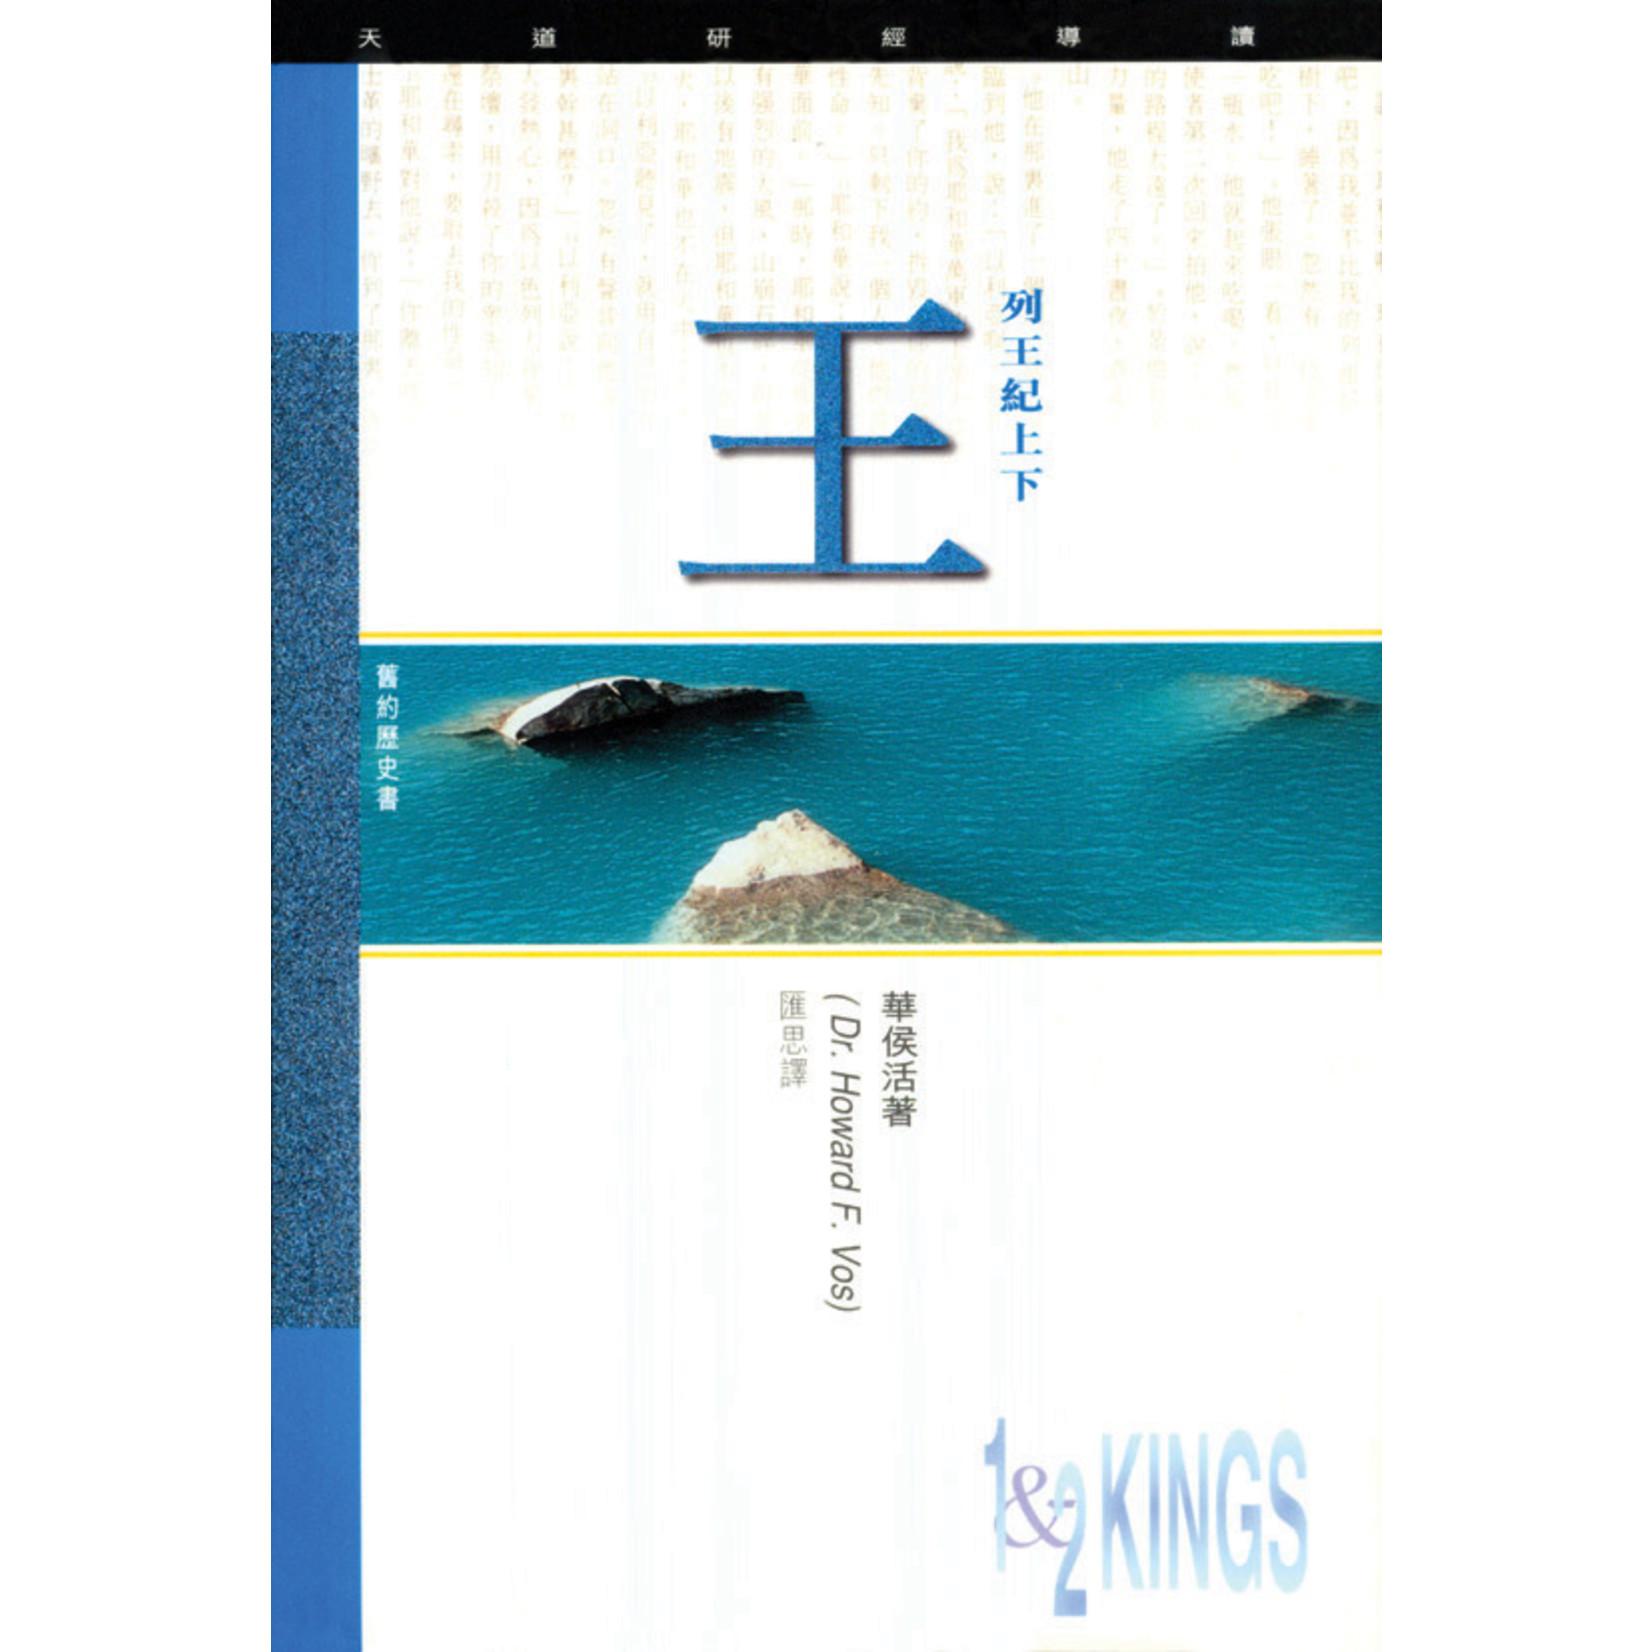 天道書樓 Tien Dao Publishing House 天道研經導讀:列王紀上下